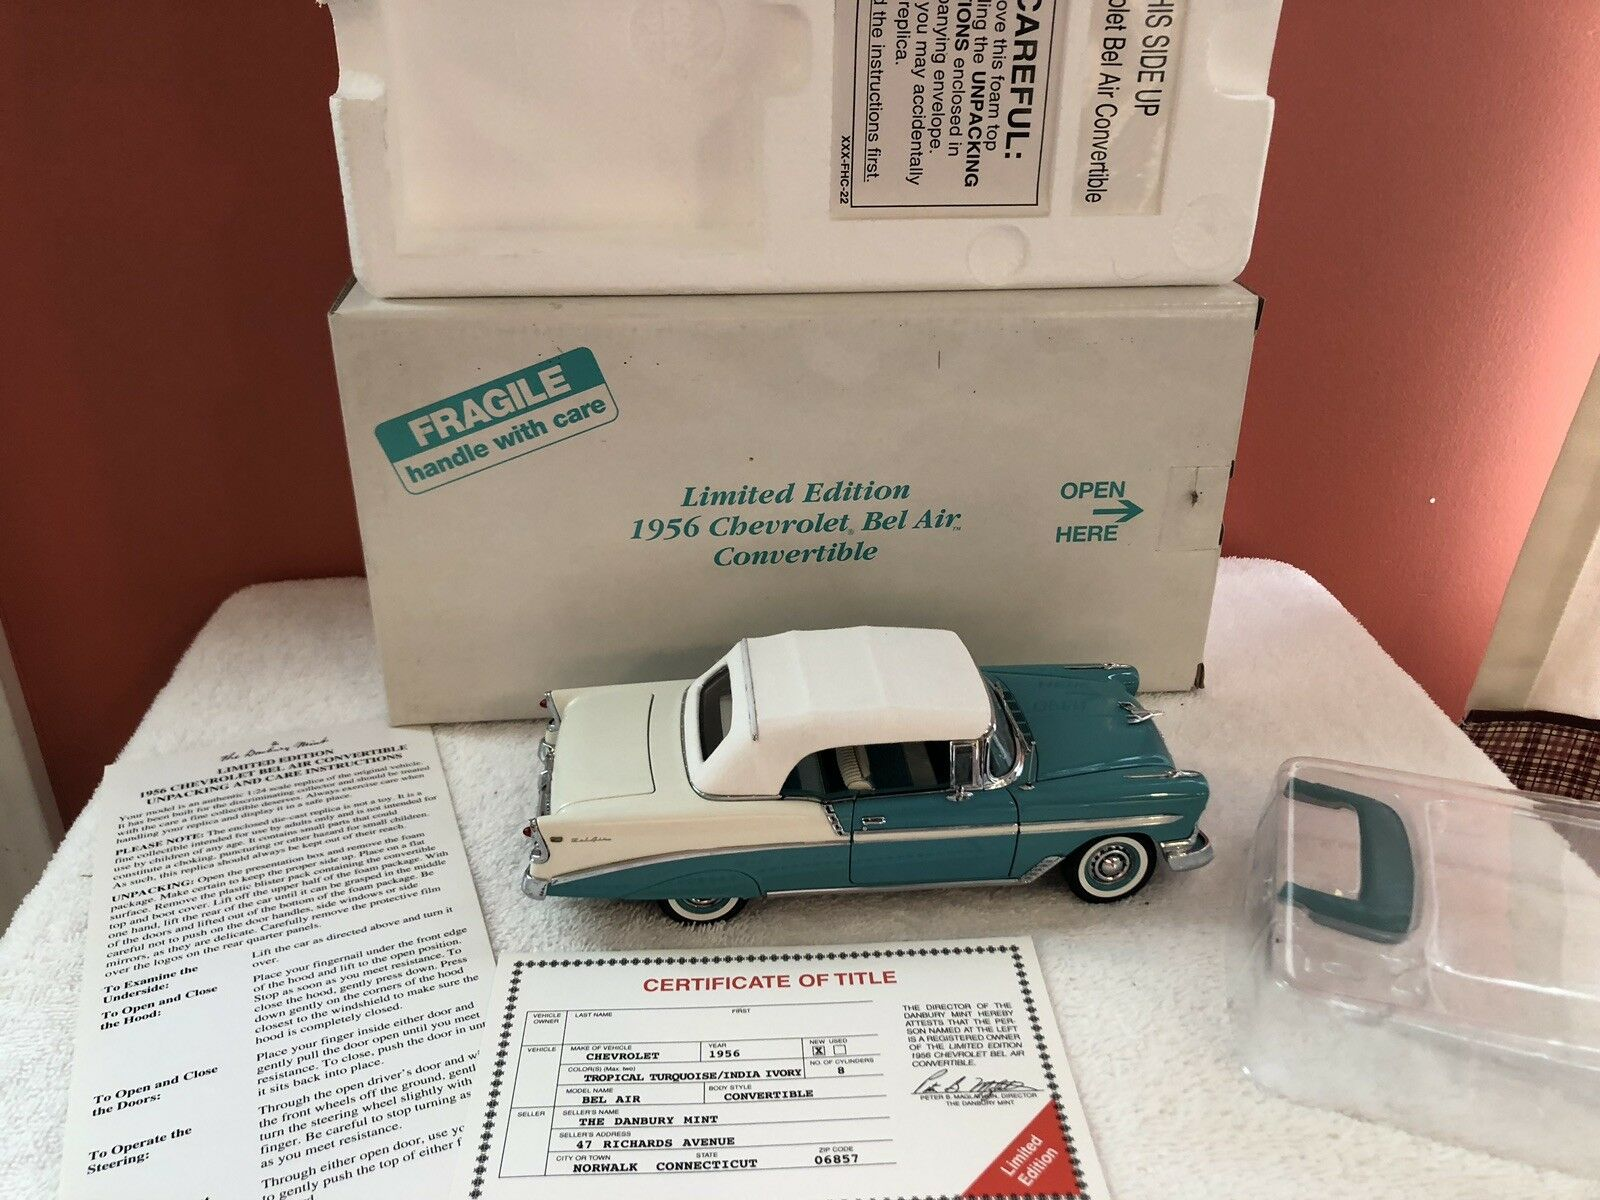 Danbury Mint Limited Edition 1956 Chevrolet BelAir Convertible.